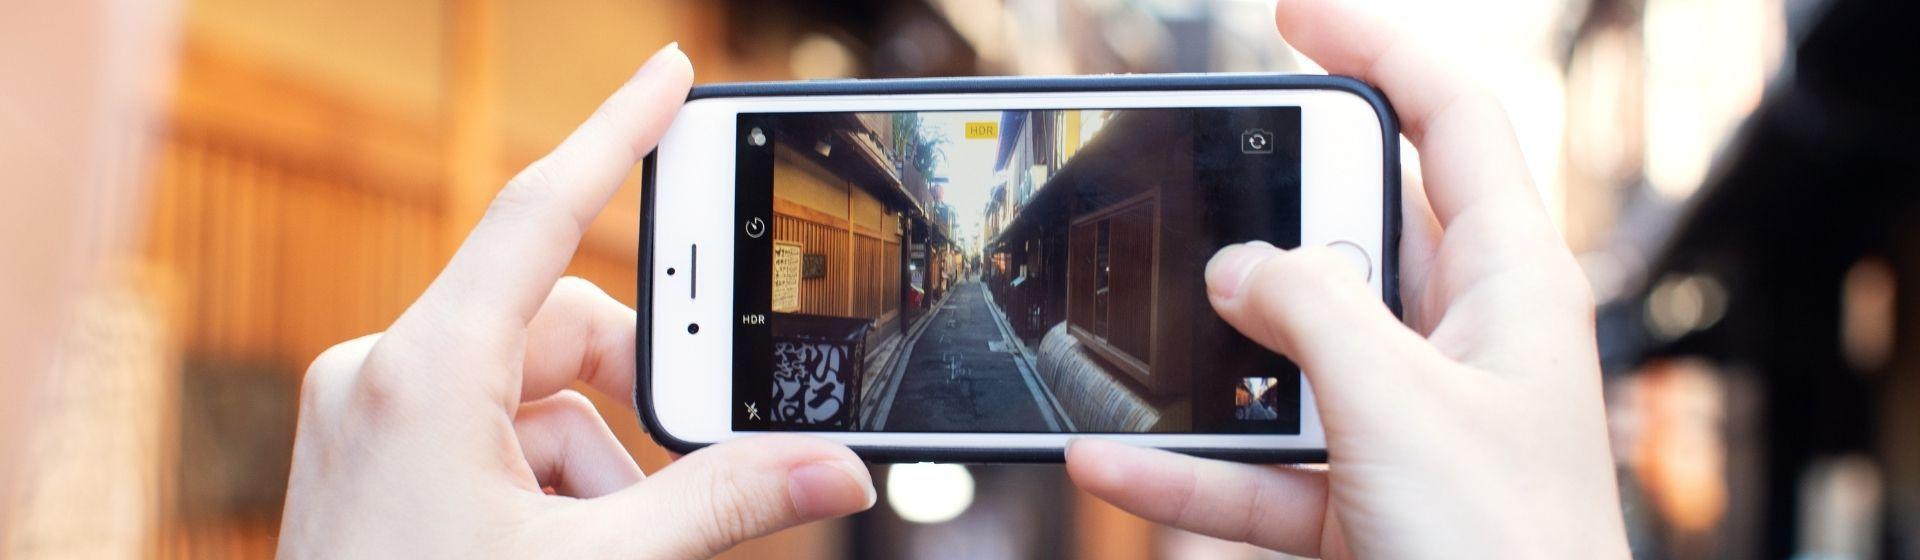 Aplicativos para cortar vídeo: confira os 4 melhores